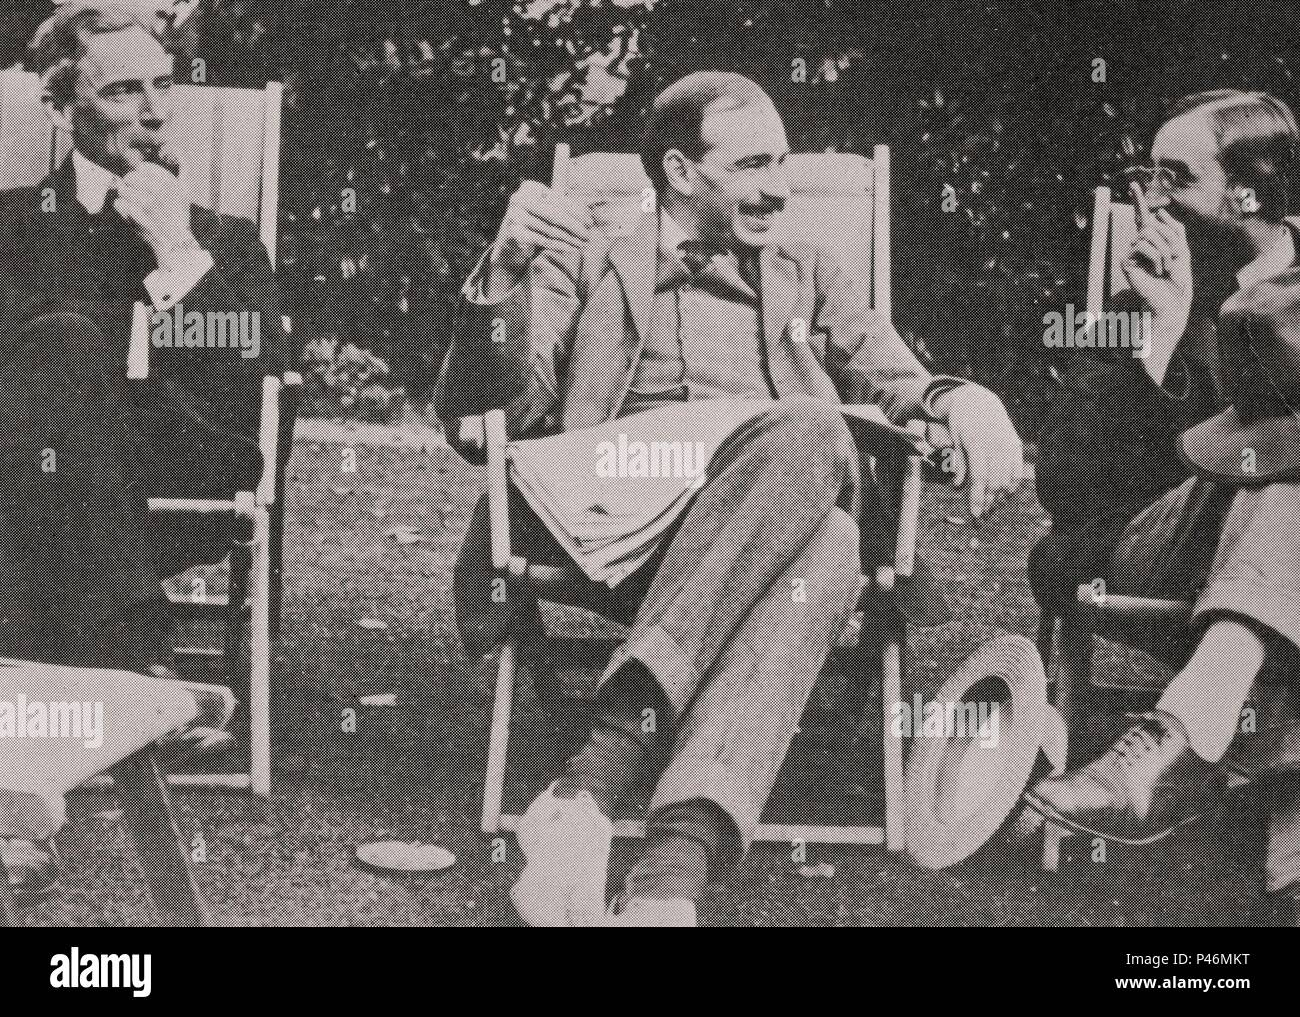 Bertrand Russell (1872-1970), matemático inglés, John Maynard Keynes (1883-1946), el economista inglés y Giles Lytton Strachey (1880-1932), escritor inglés. 1915. Foto de stock